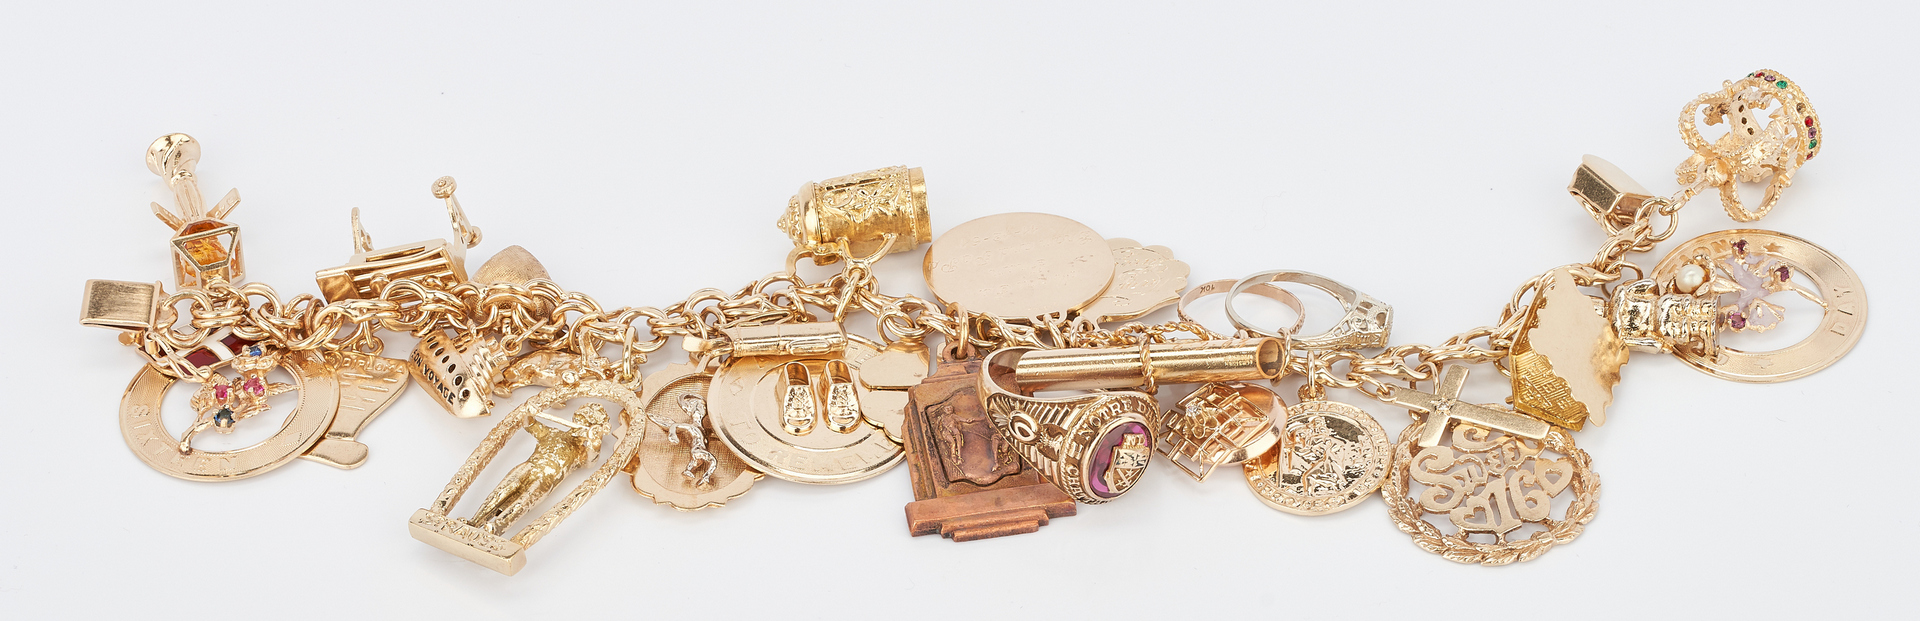 Lot 42: 14K Charm Bracelet with 30 Charms